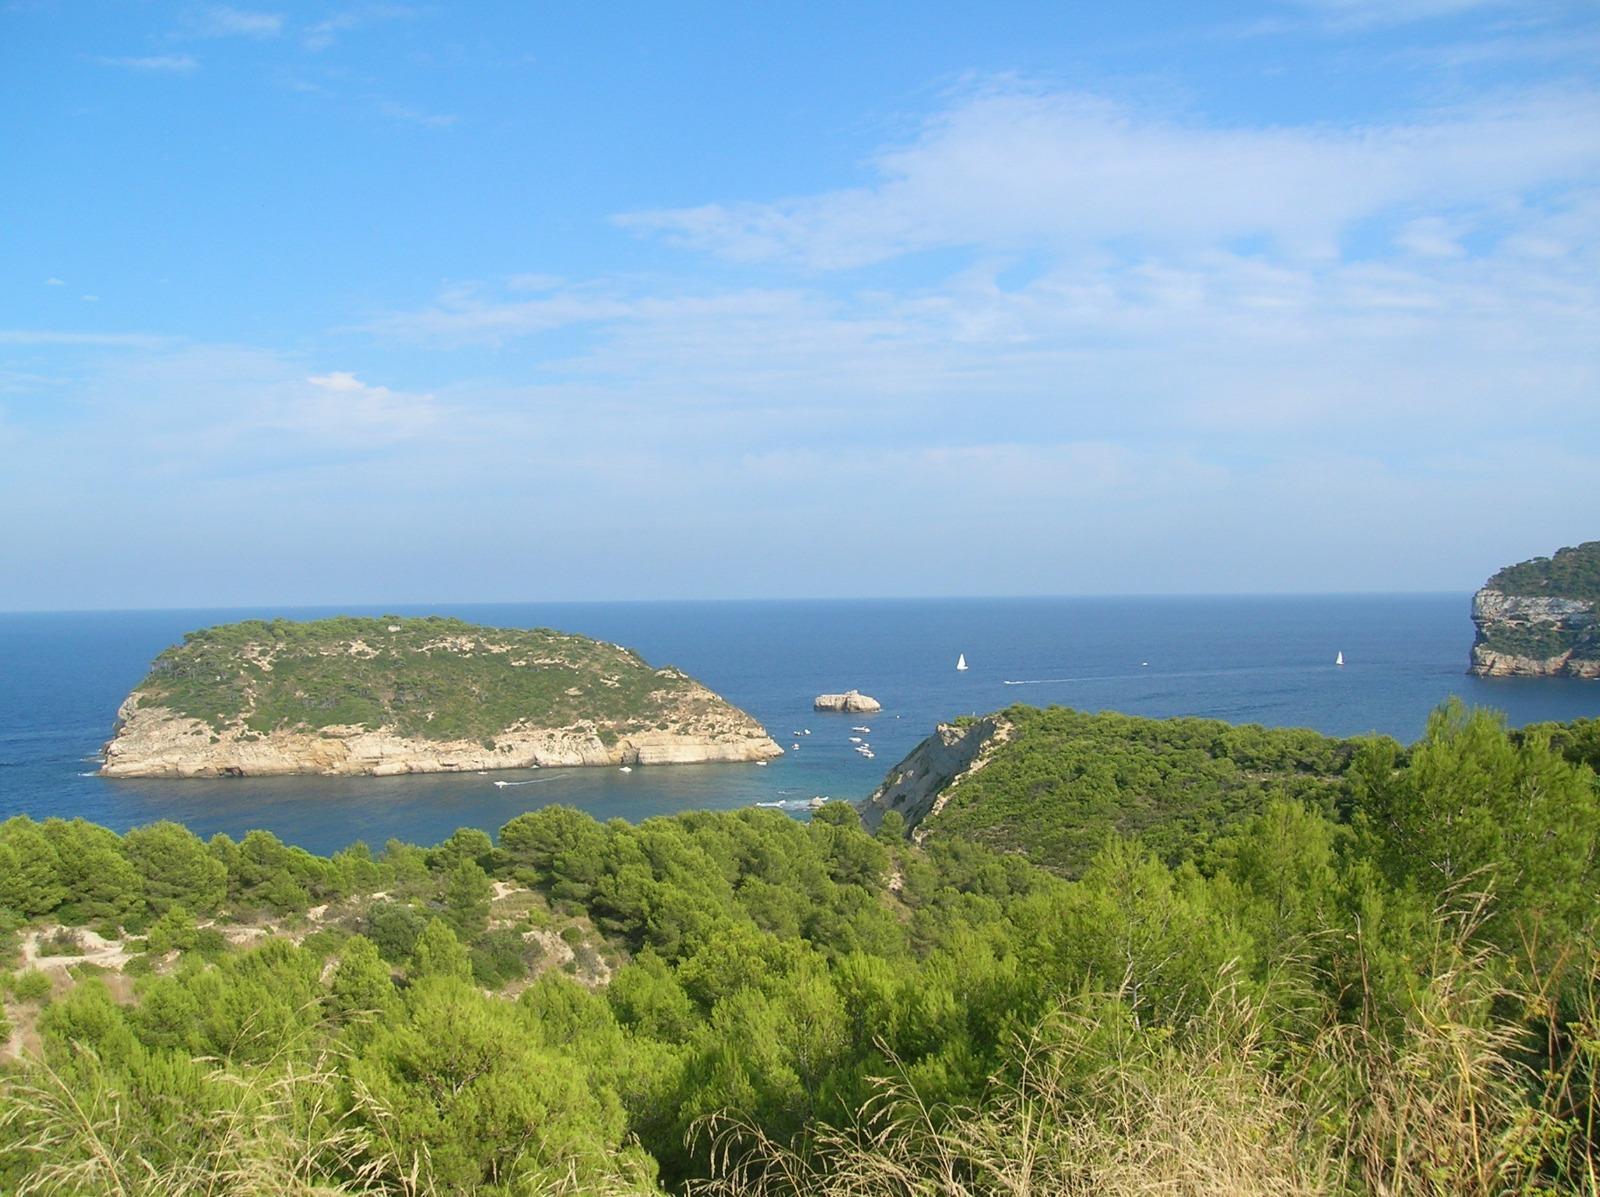 Una Spagna un po' diversa: la Costa Blanca